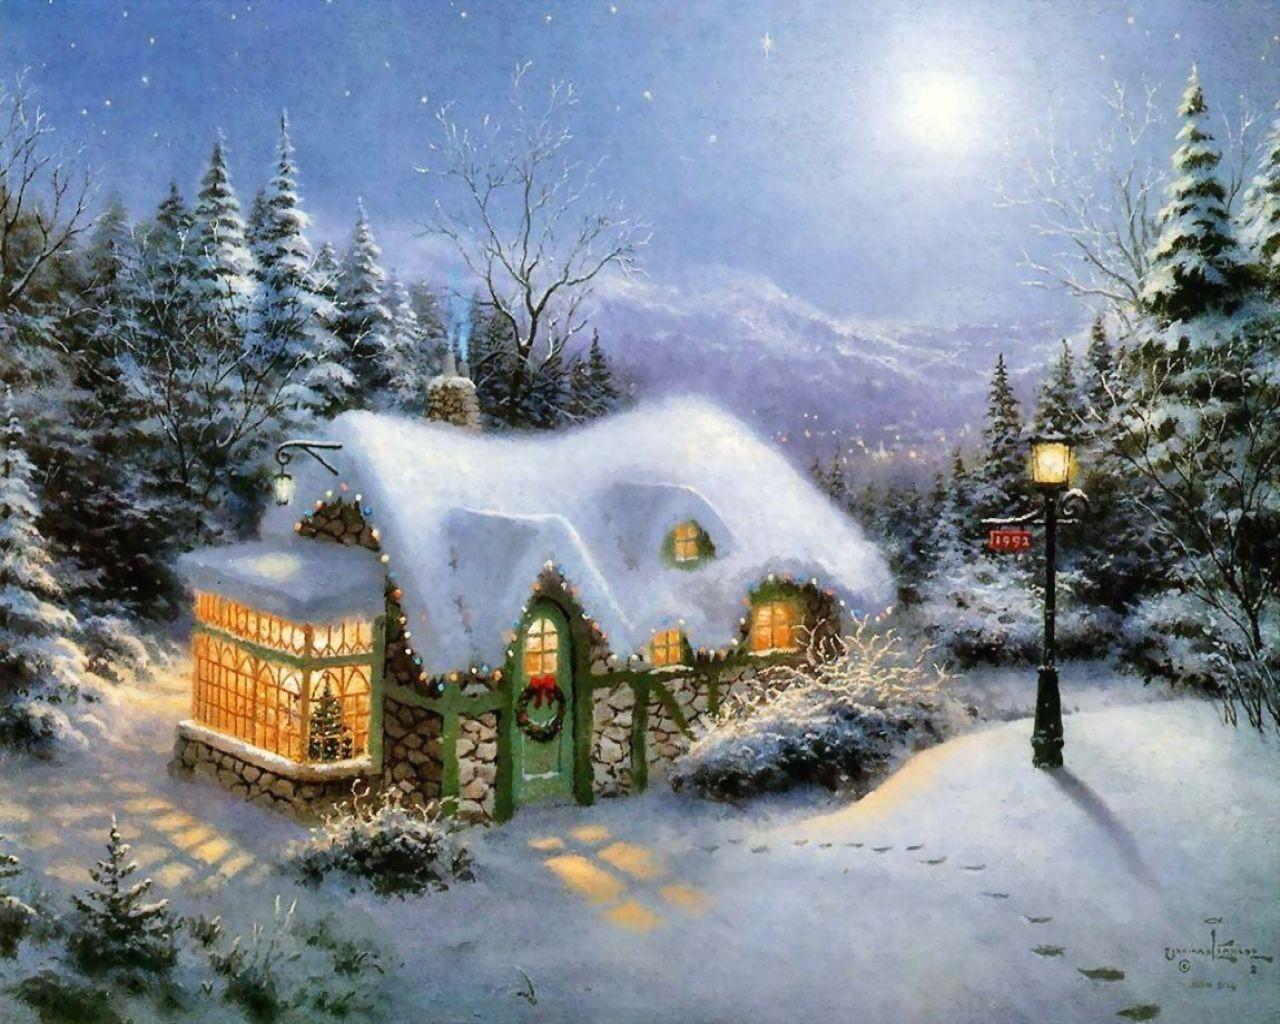 http://images4.fanpop.com/image/photos/23400000/Thomas-Kinkade-Winter-winter-23436564-1280-1024.jpg